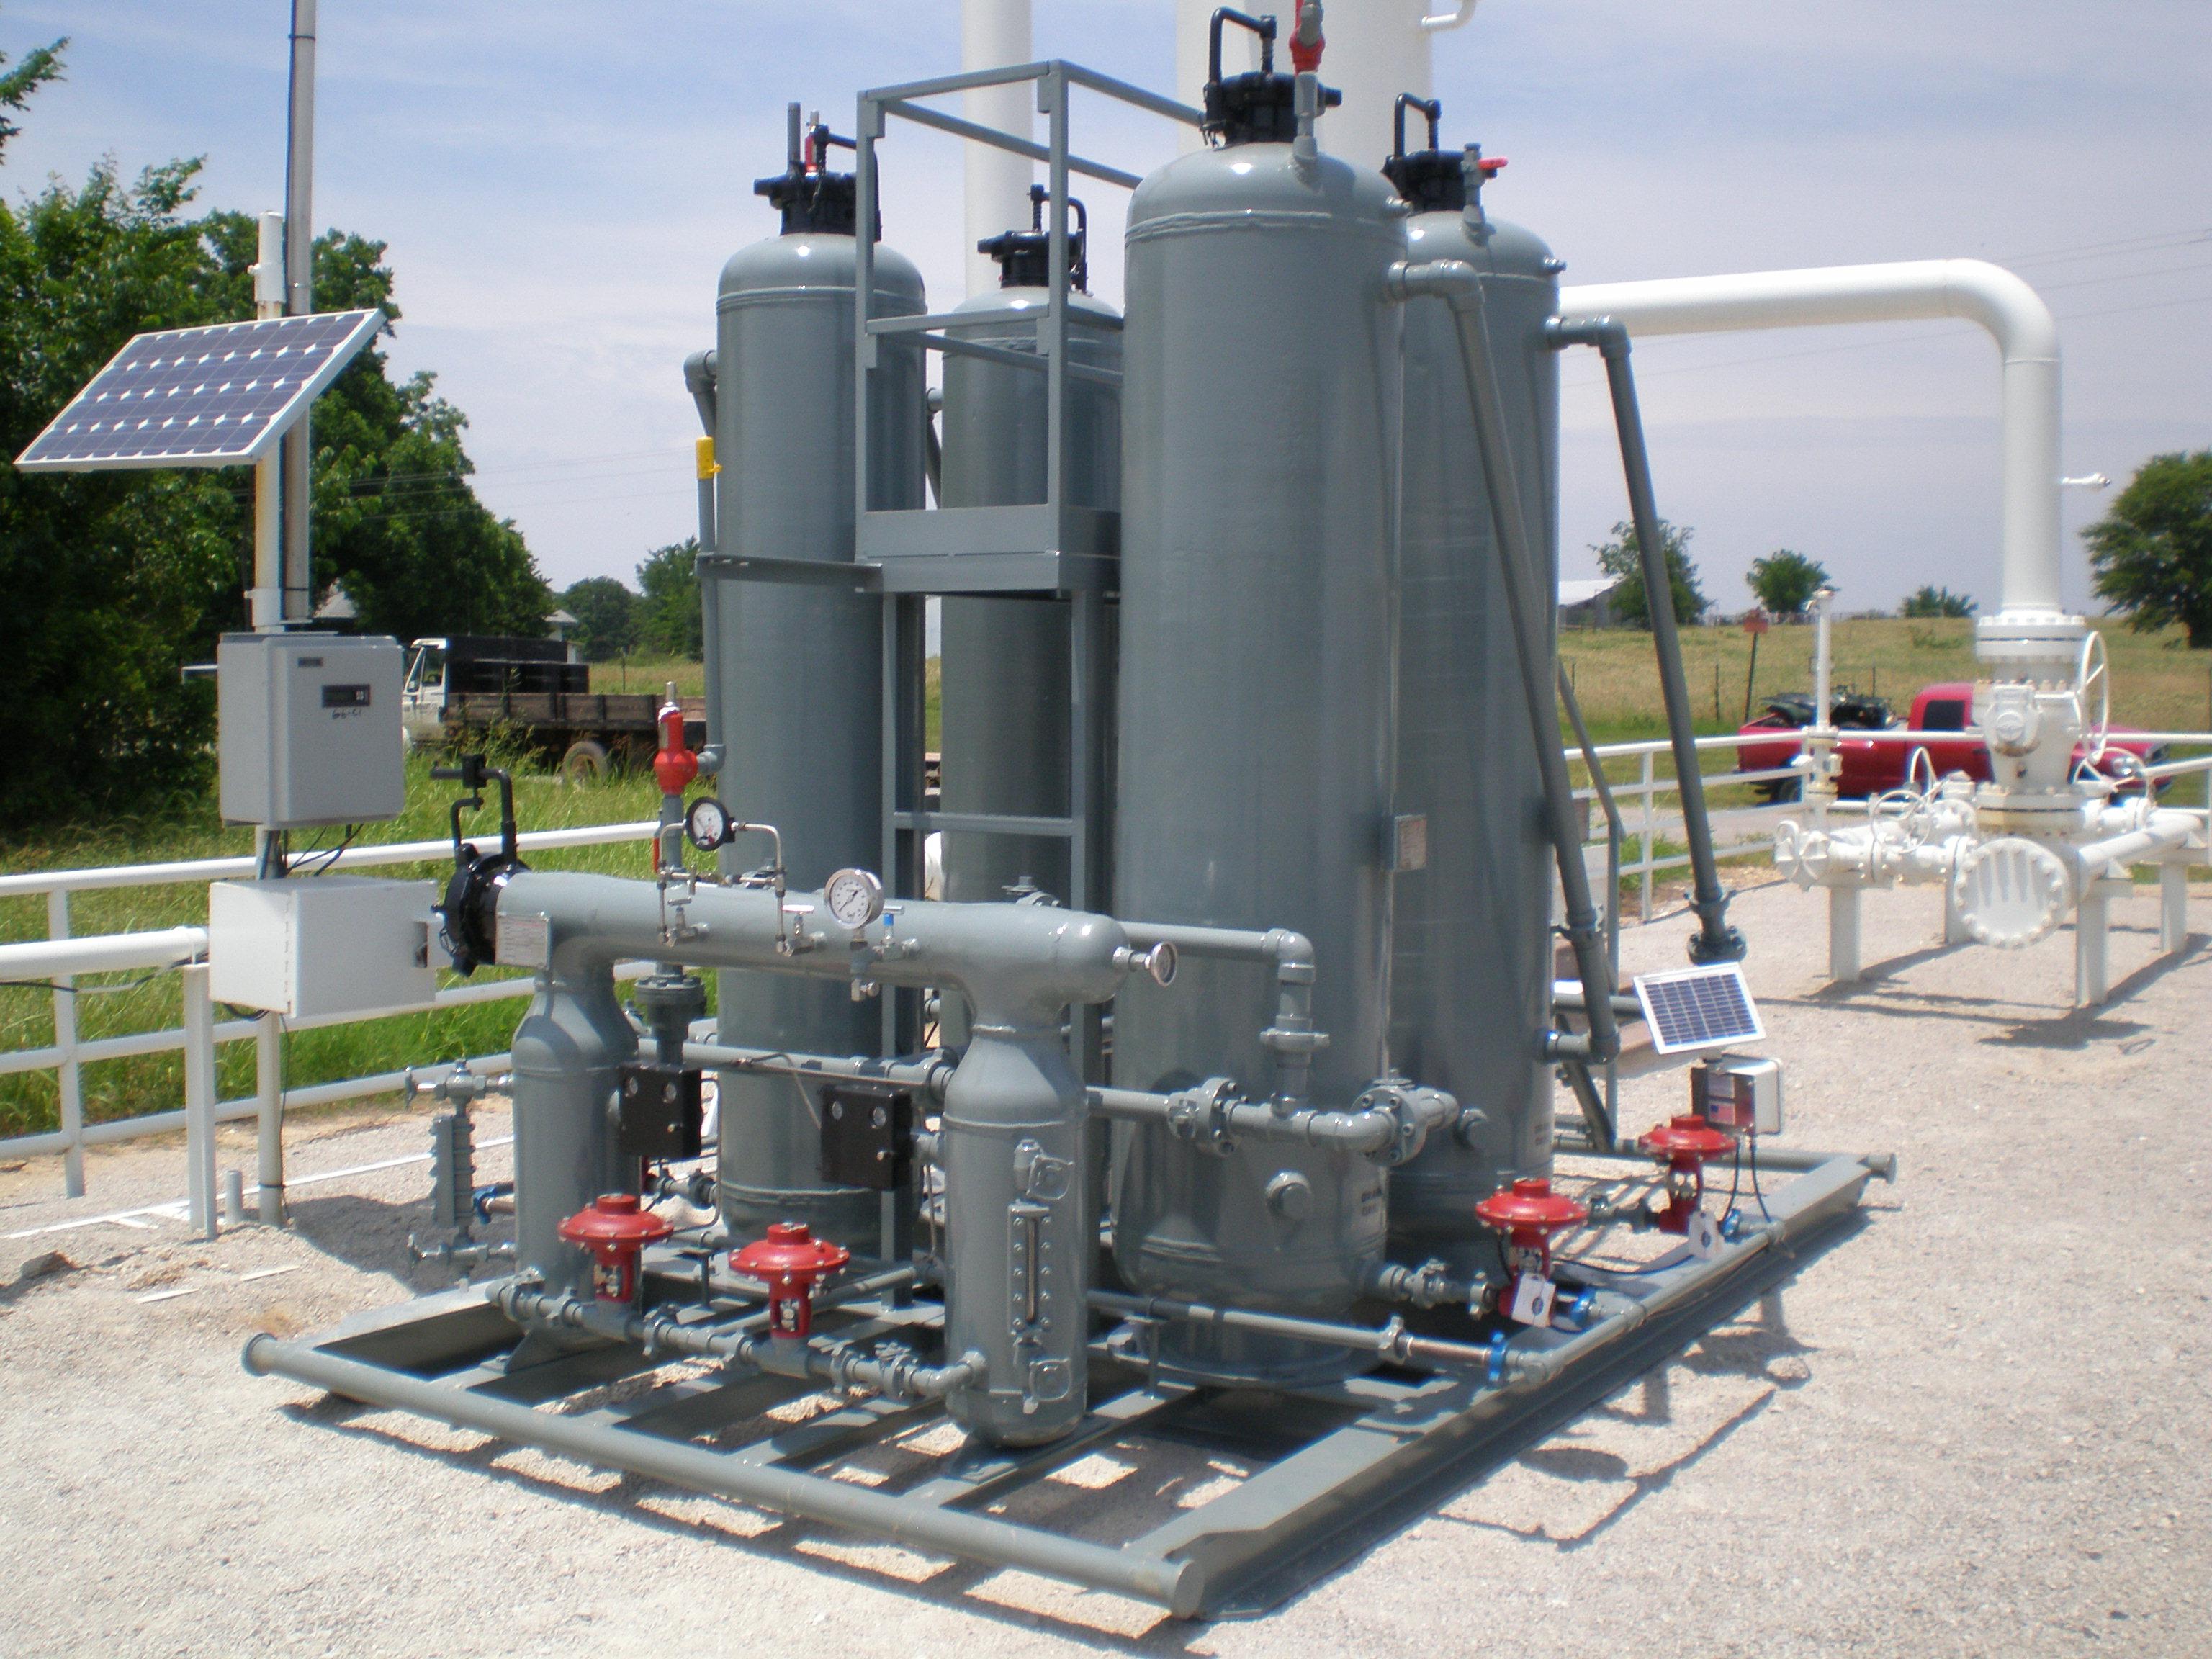 CROFT Passive Dehydration System (PDS)